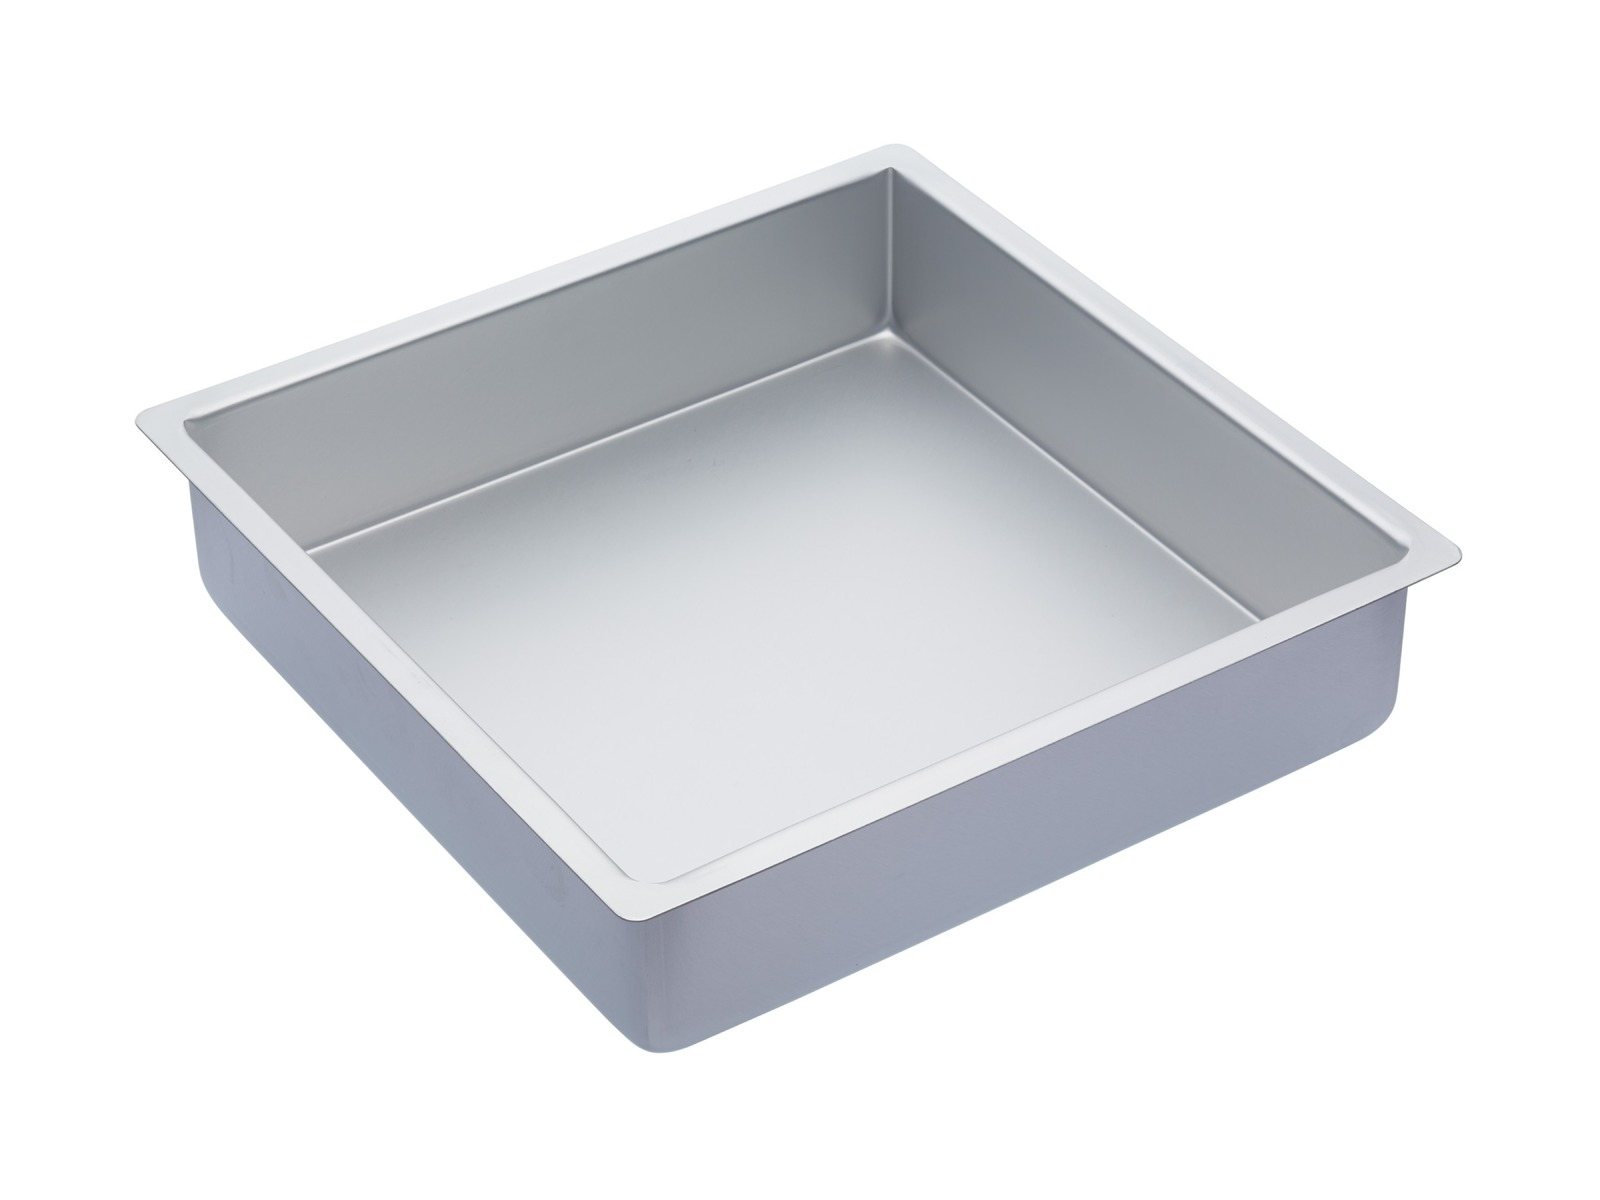 MasterClass: Silver Anodised Square Deep Cake Pan (30.5cm) image